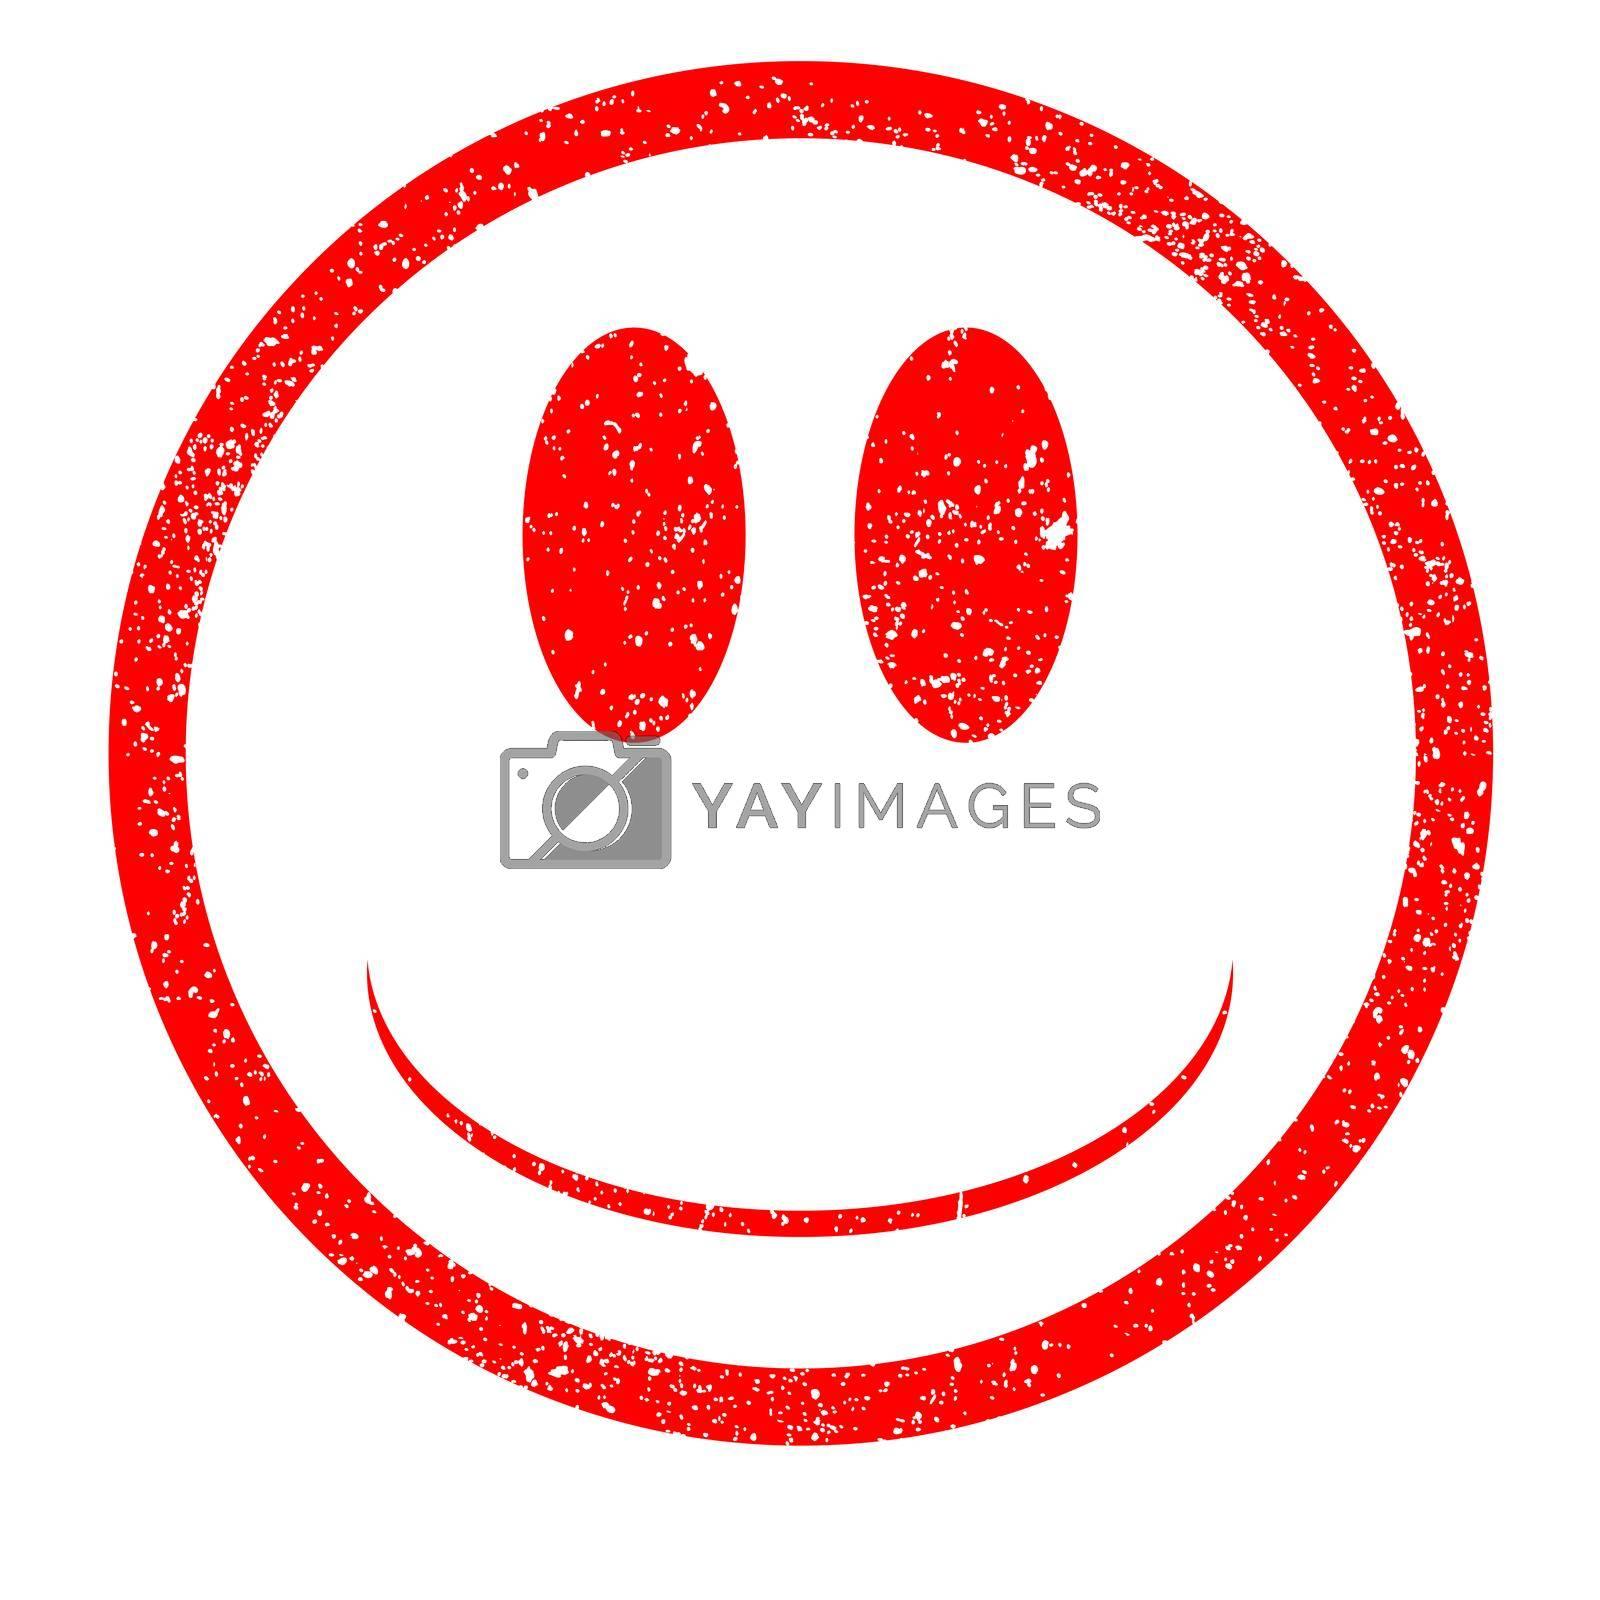 Royalty free image of Emoji Rubber Stamp by Bigalbaloo